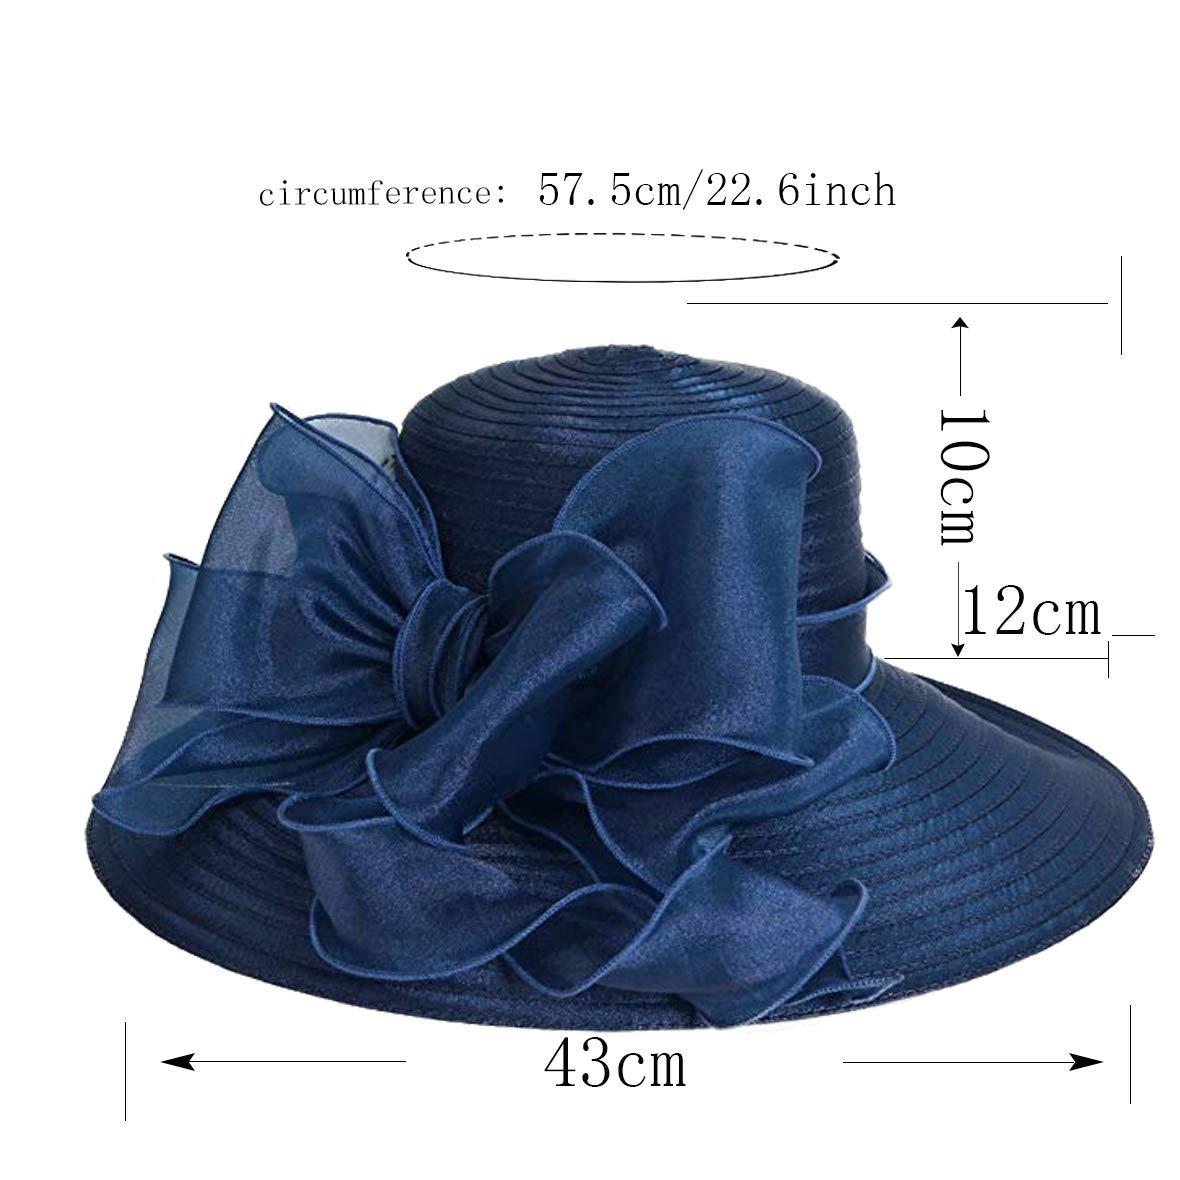 Women Kentucky Derby Church Dress Cloche Hat Fascinator Floral Tea Party Wedding Bucket Hat S052 (S062-Navy) by Ruphedy (Image #2)